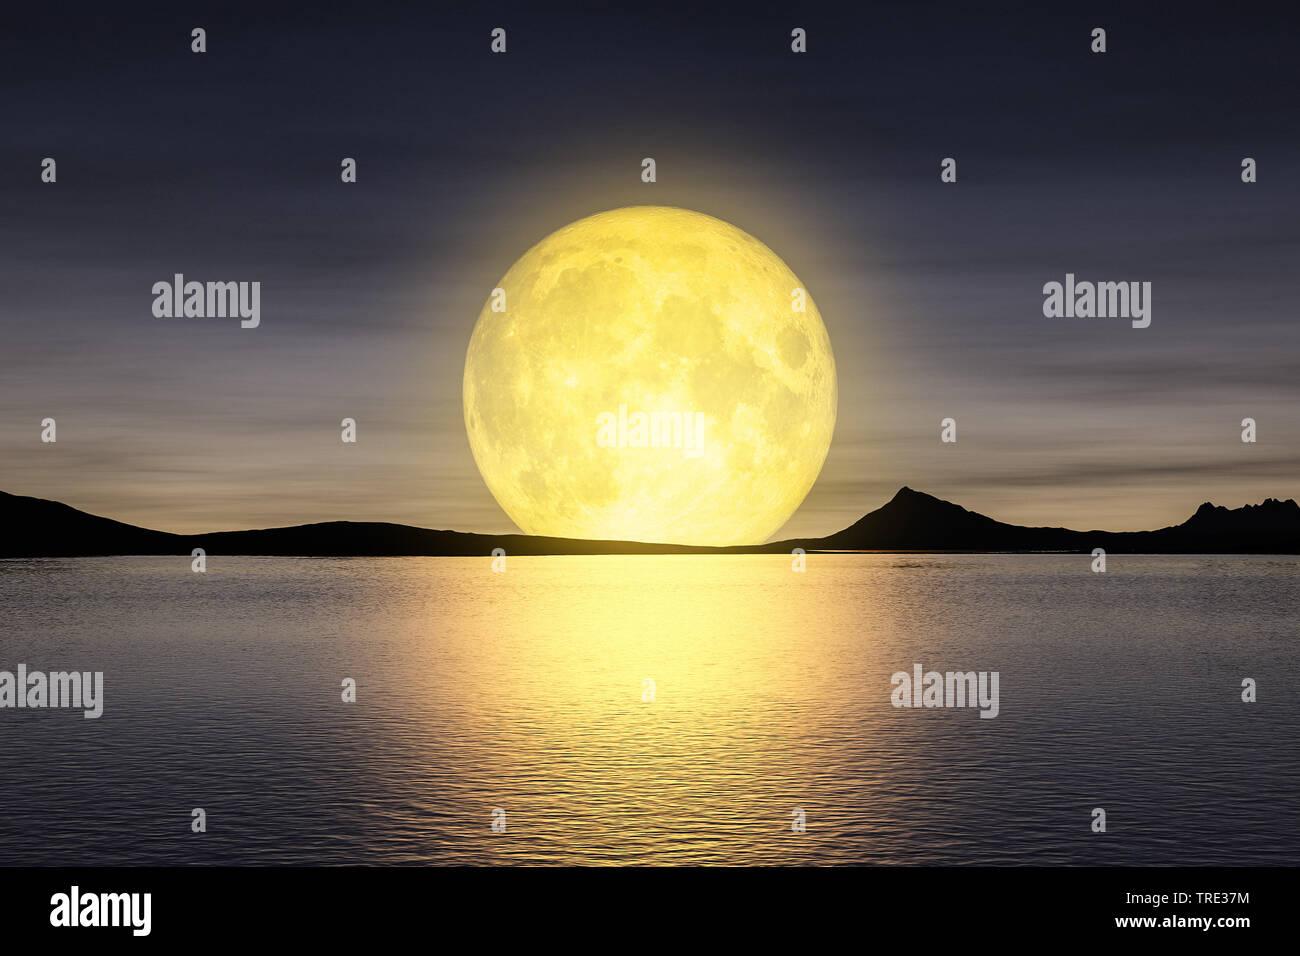 Monaufgang ueber dem Meer, Computergraphik   3d rendering of a moon rising over the sey   BLWS516017.jpg [ (c) blickwinkel/McPHOTO/M. Gann Tel. +49 (0 - Stock Image